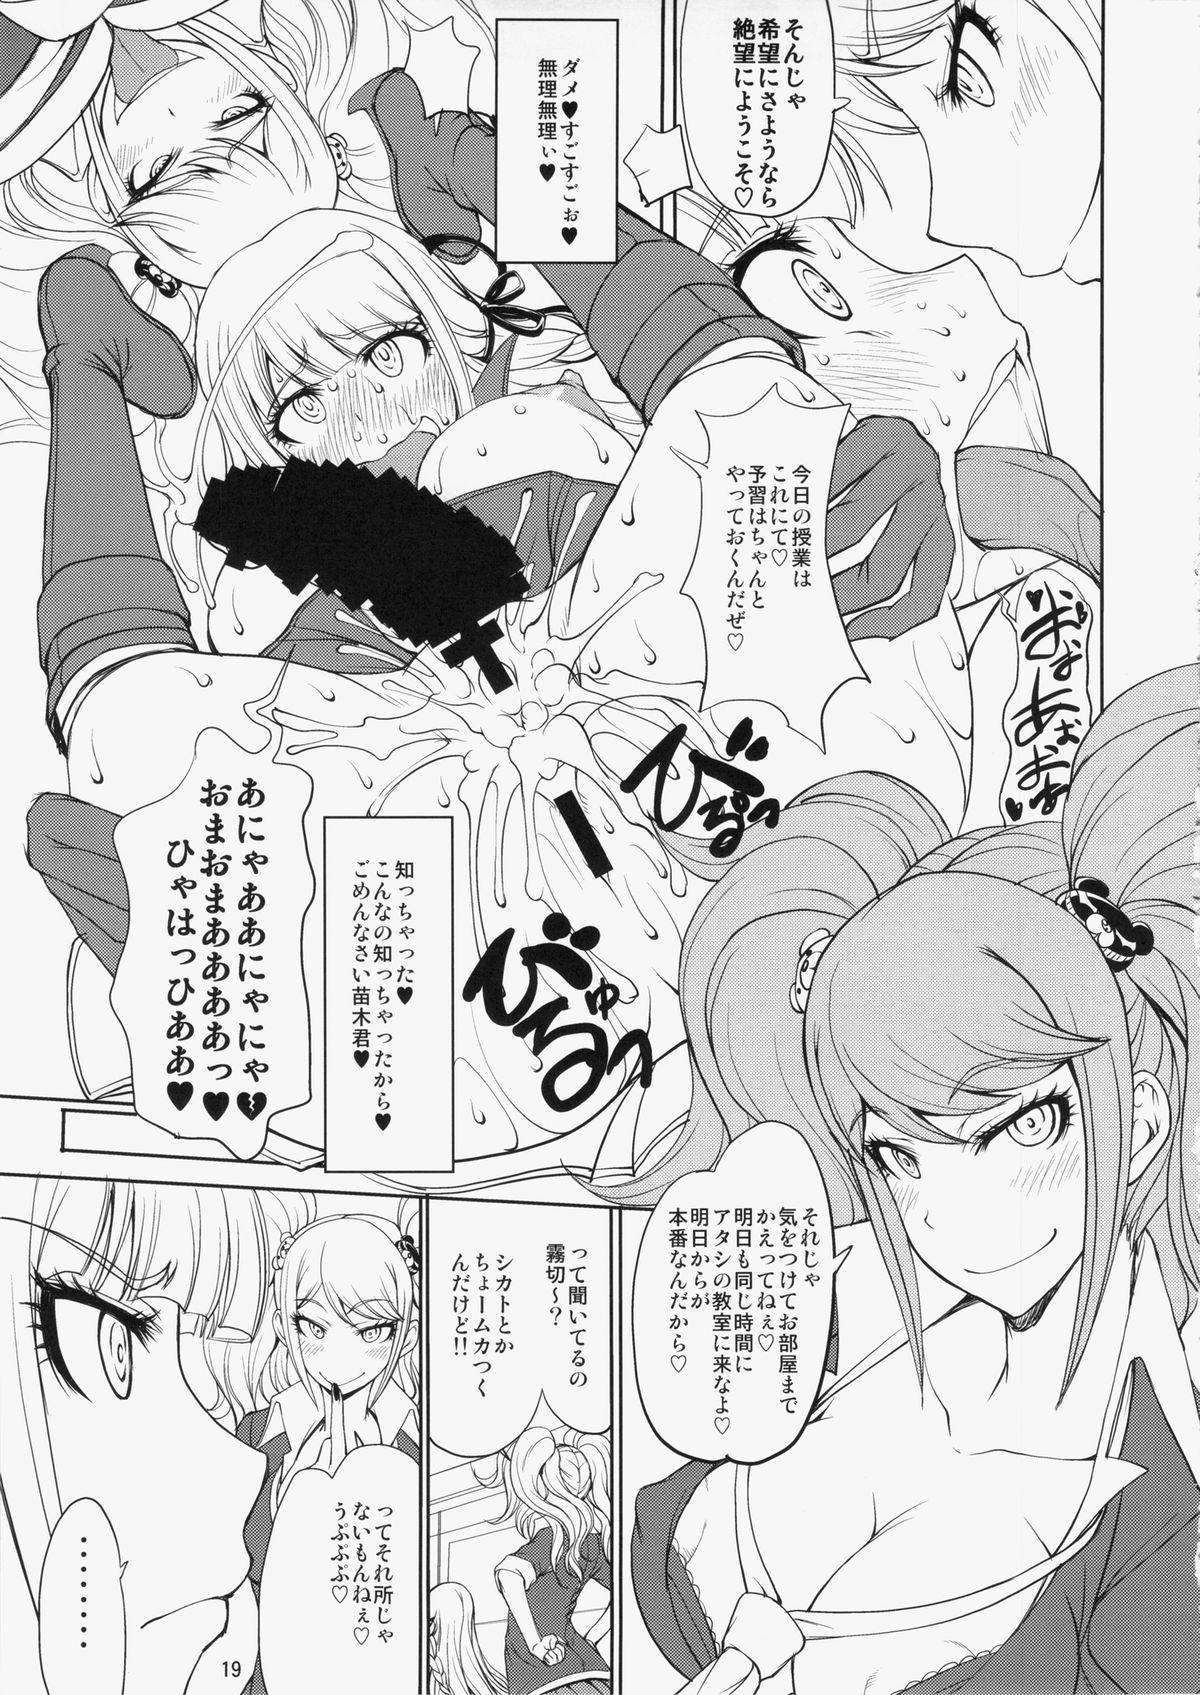 (C85) [Majimadou (Matou)] Enoshima-sensei no Chou Zetsubou-teki Zecchou Jugyou (Danganronpa) 17